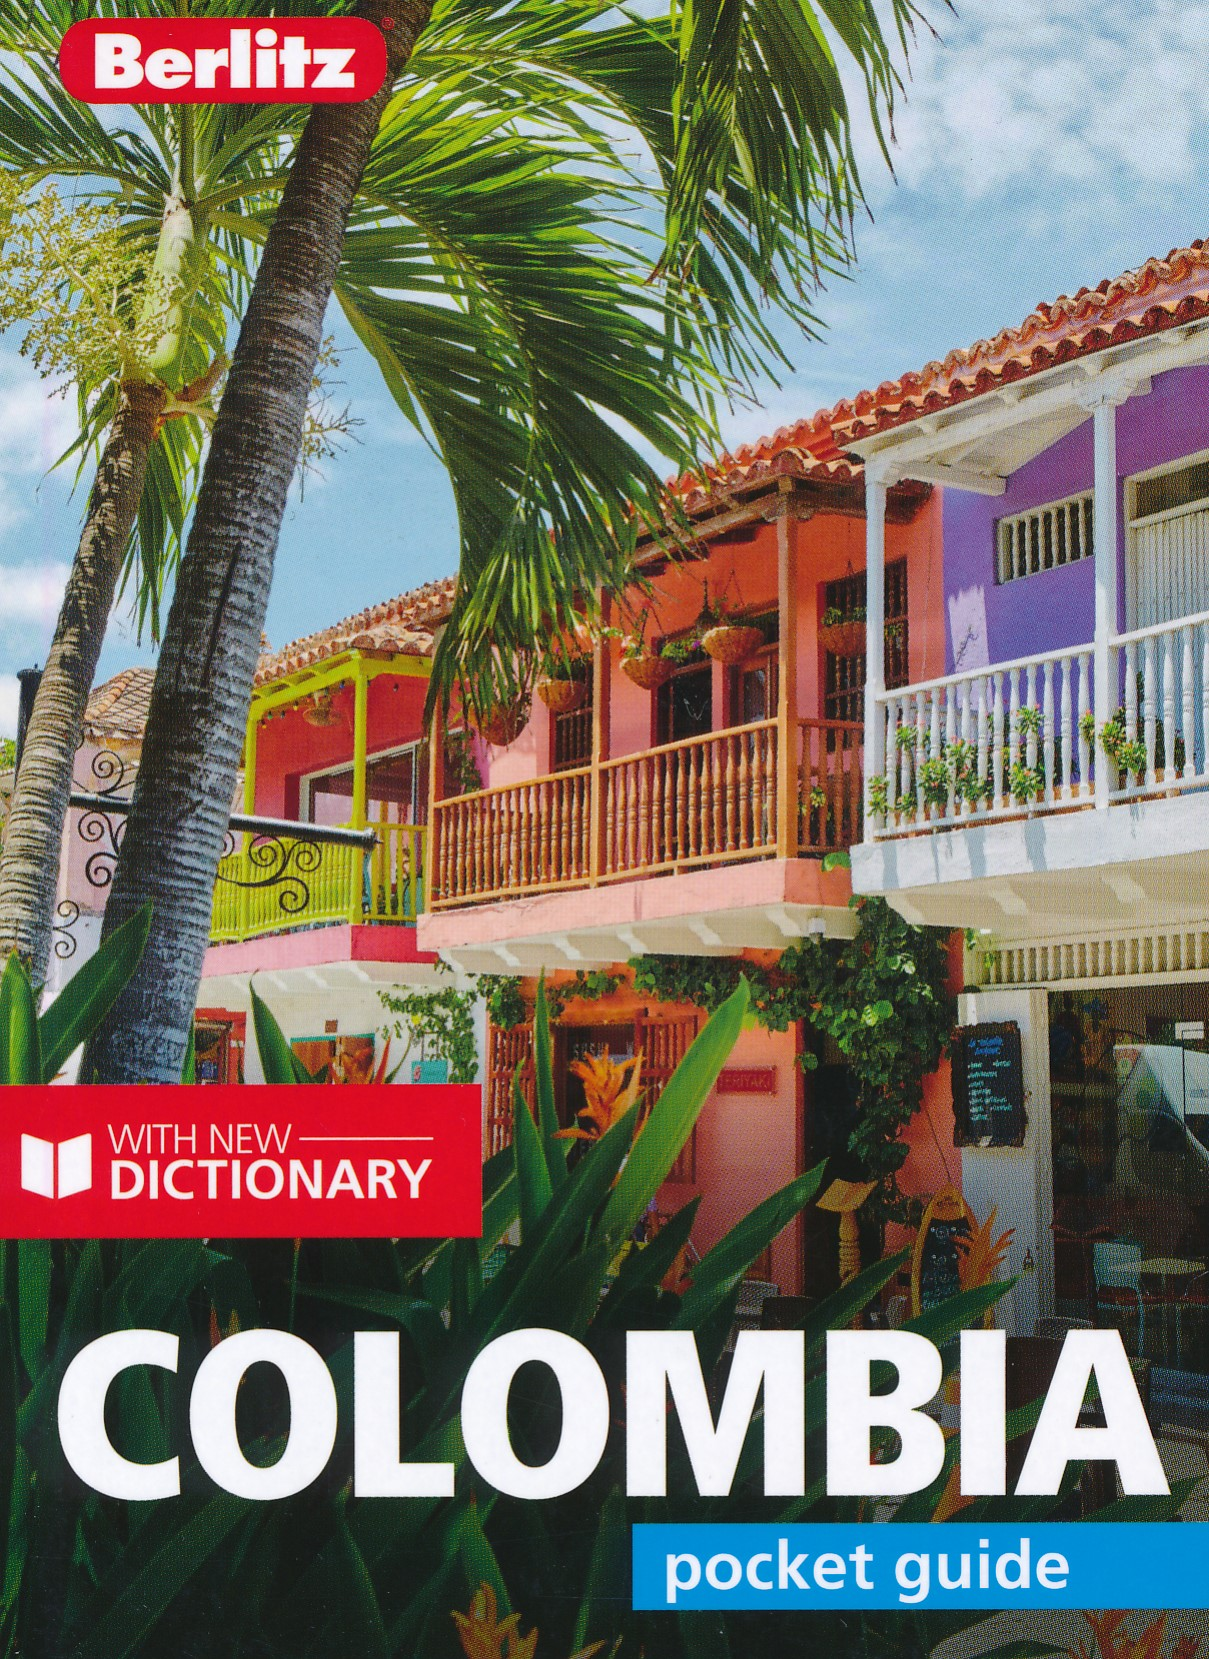 Reisgids Pocket Guide Colombia | Berlitz